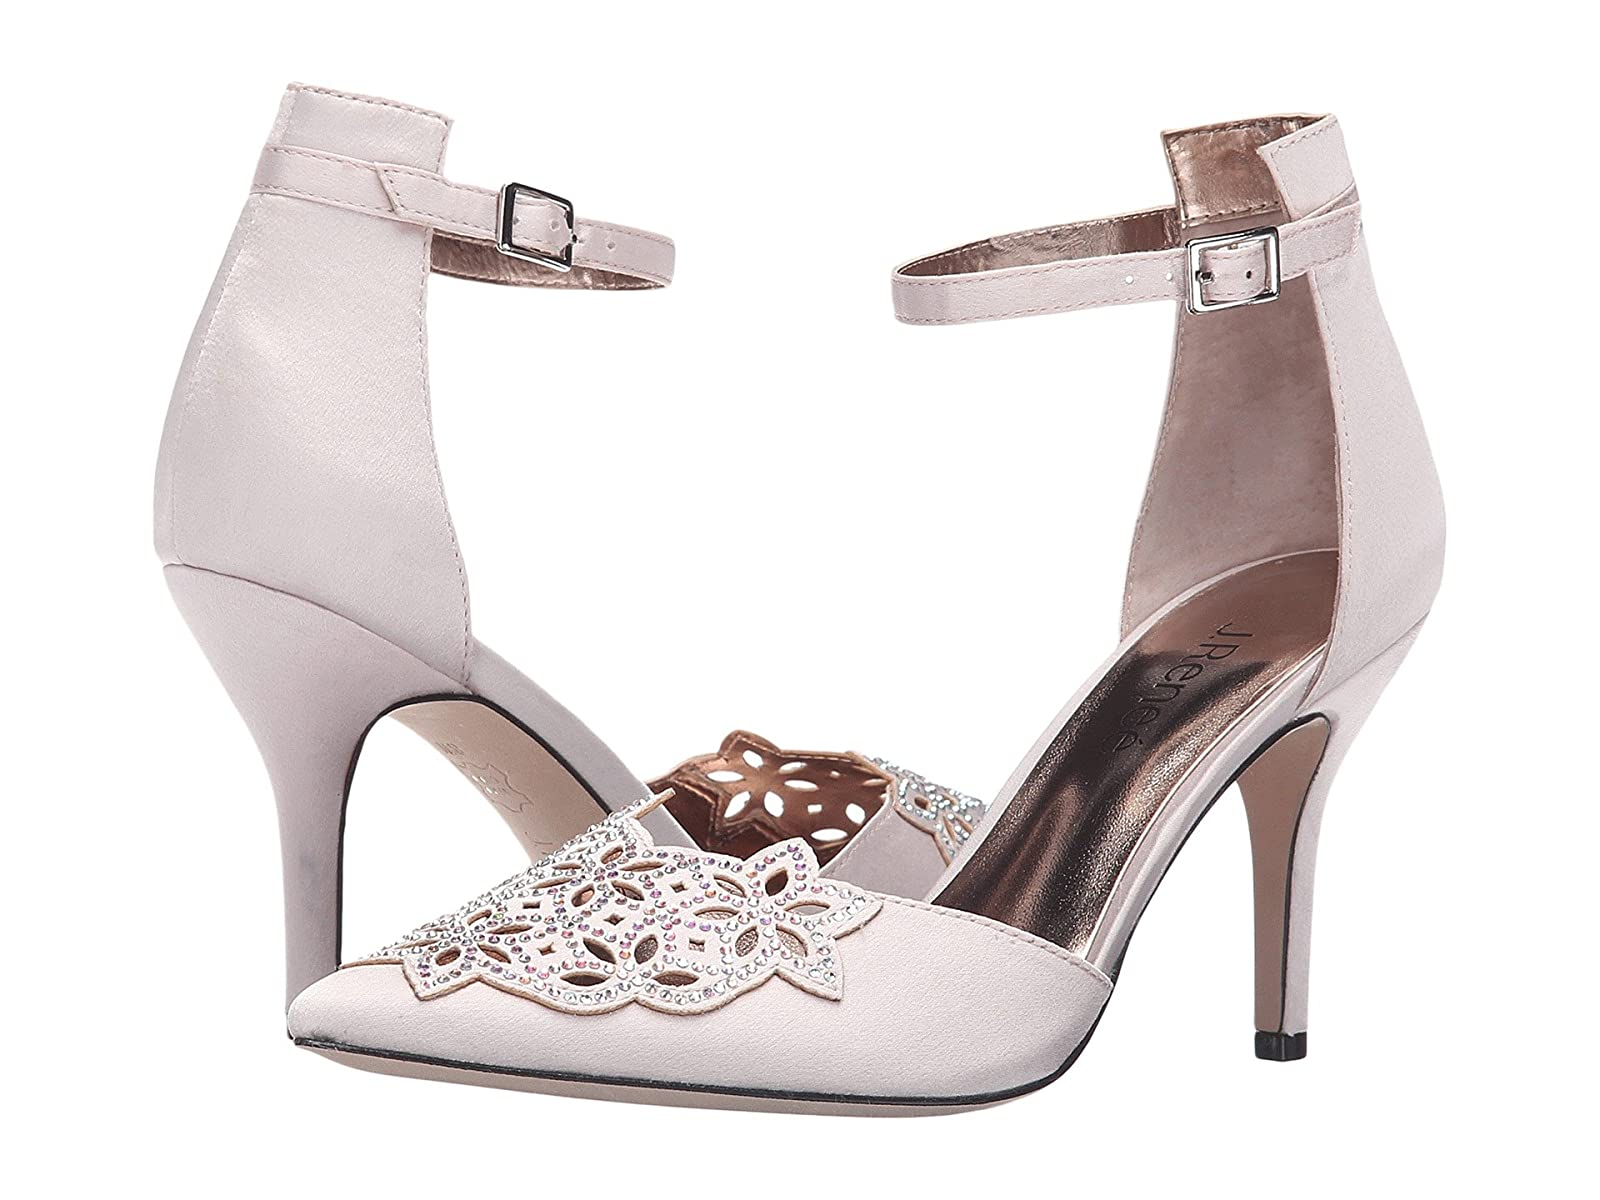 J. Renee BicarriCheap and distinctive eye-catching shoes